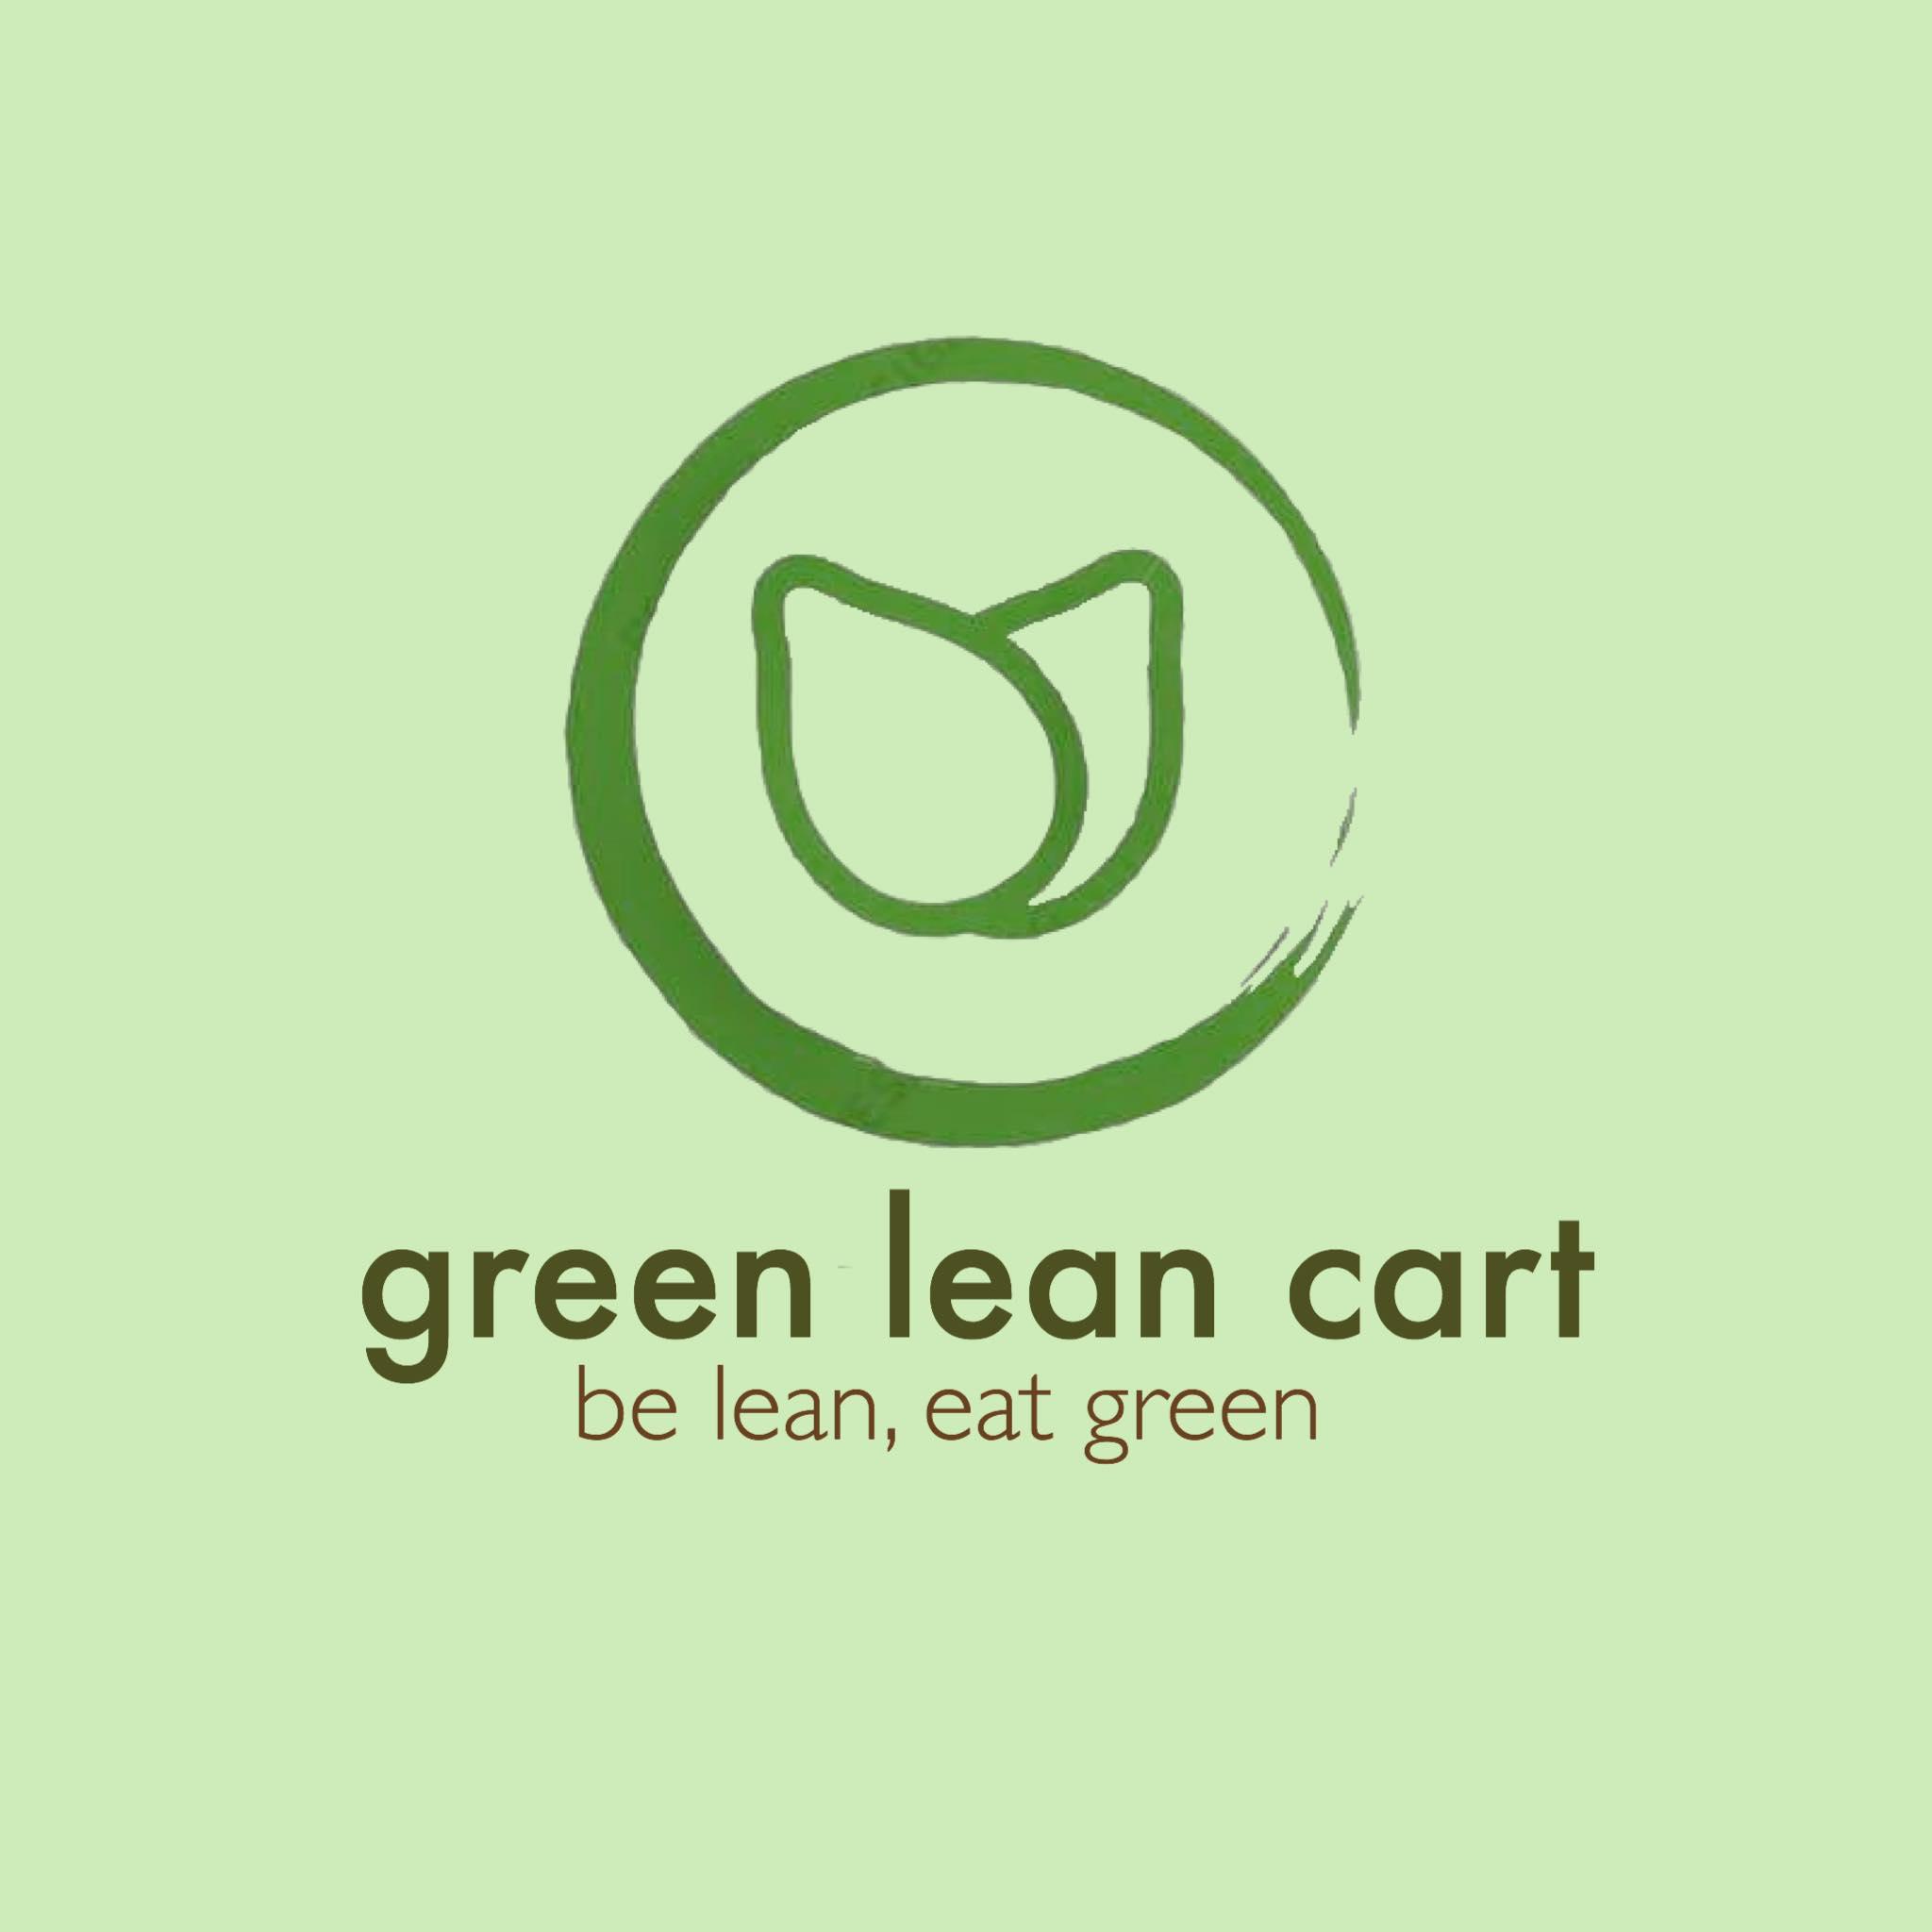 Greenleancart.ph